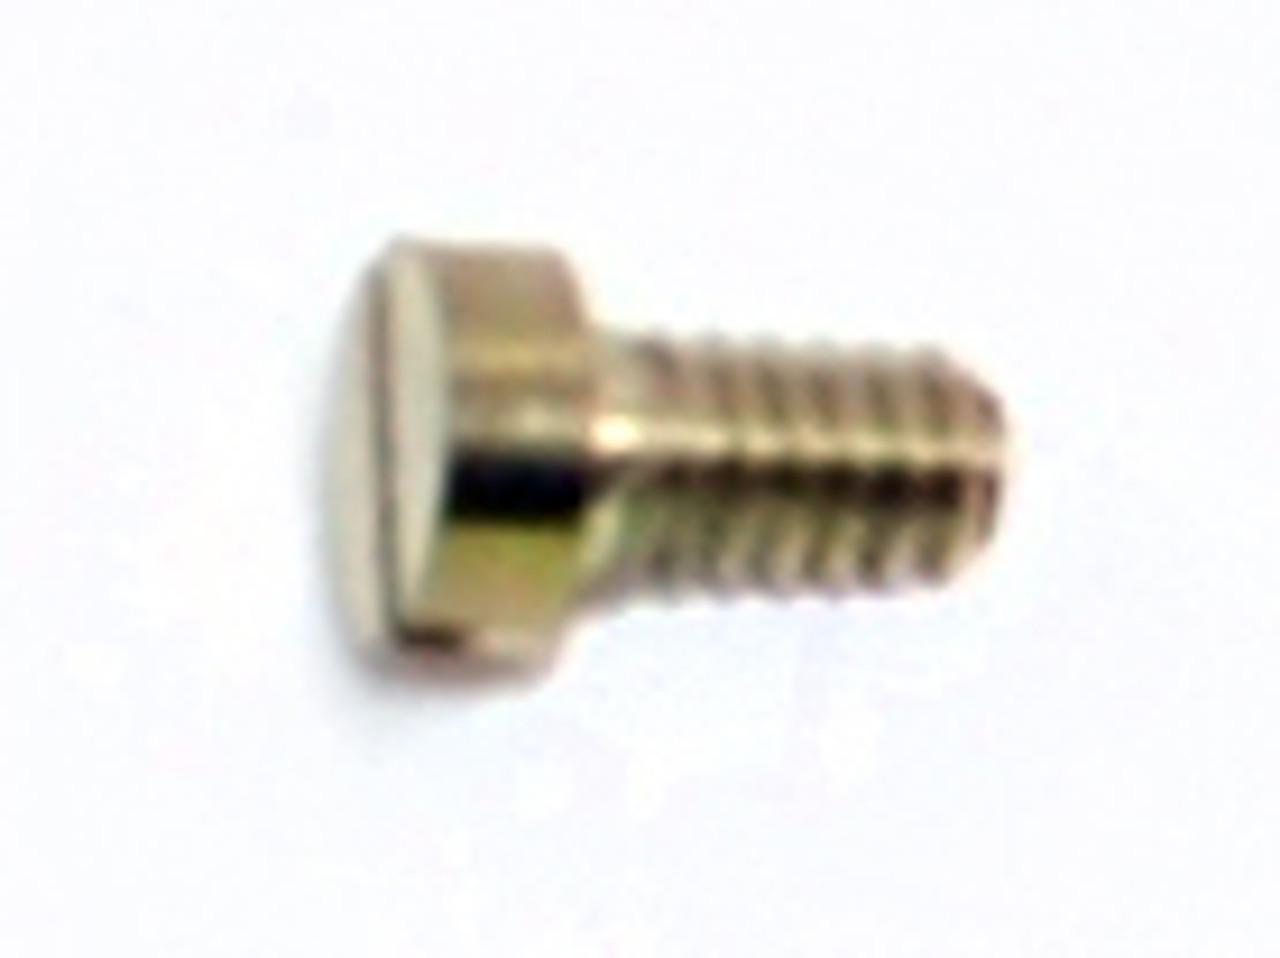 2.9mm Length 2.8mm Head SM079 Hinge Repair Screw; 1.2mm Thread